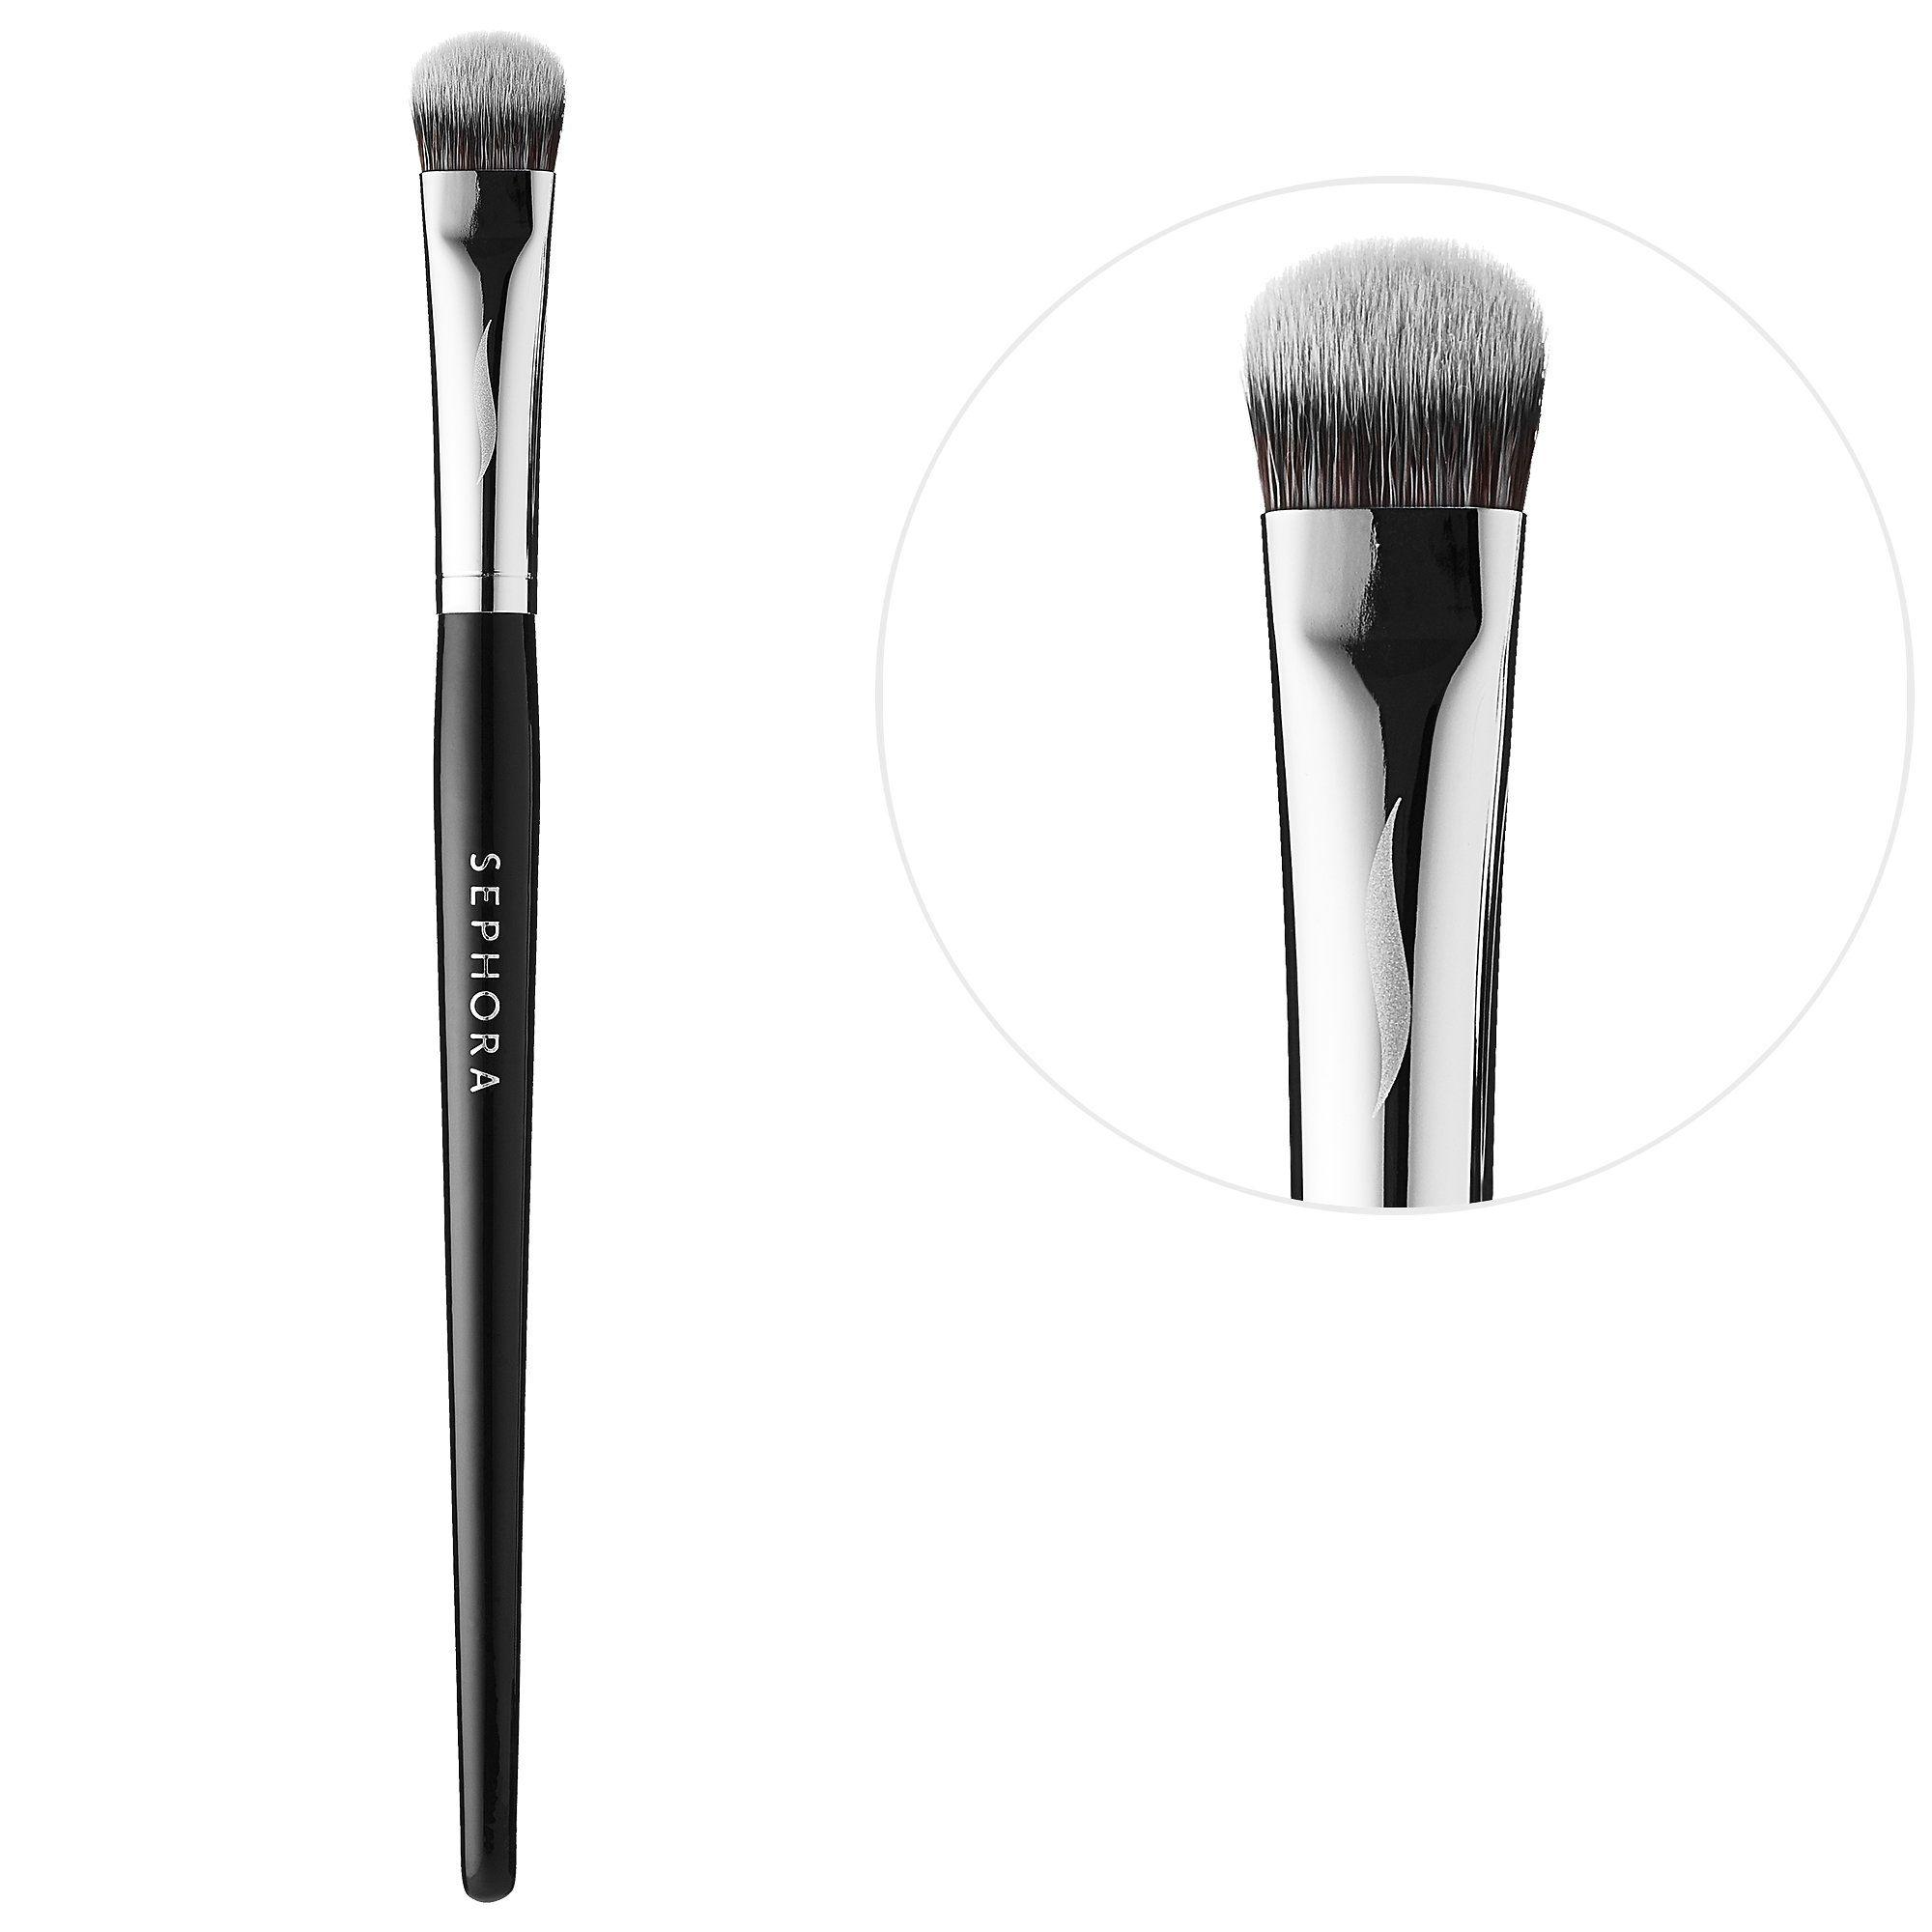 PRO Concealer 71 Concealer brush, Pro concealer, Sephora